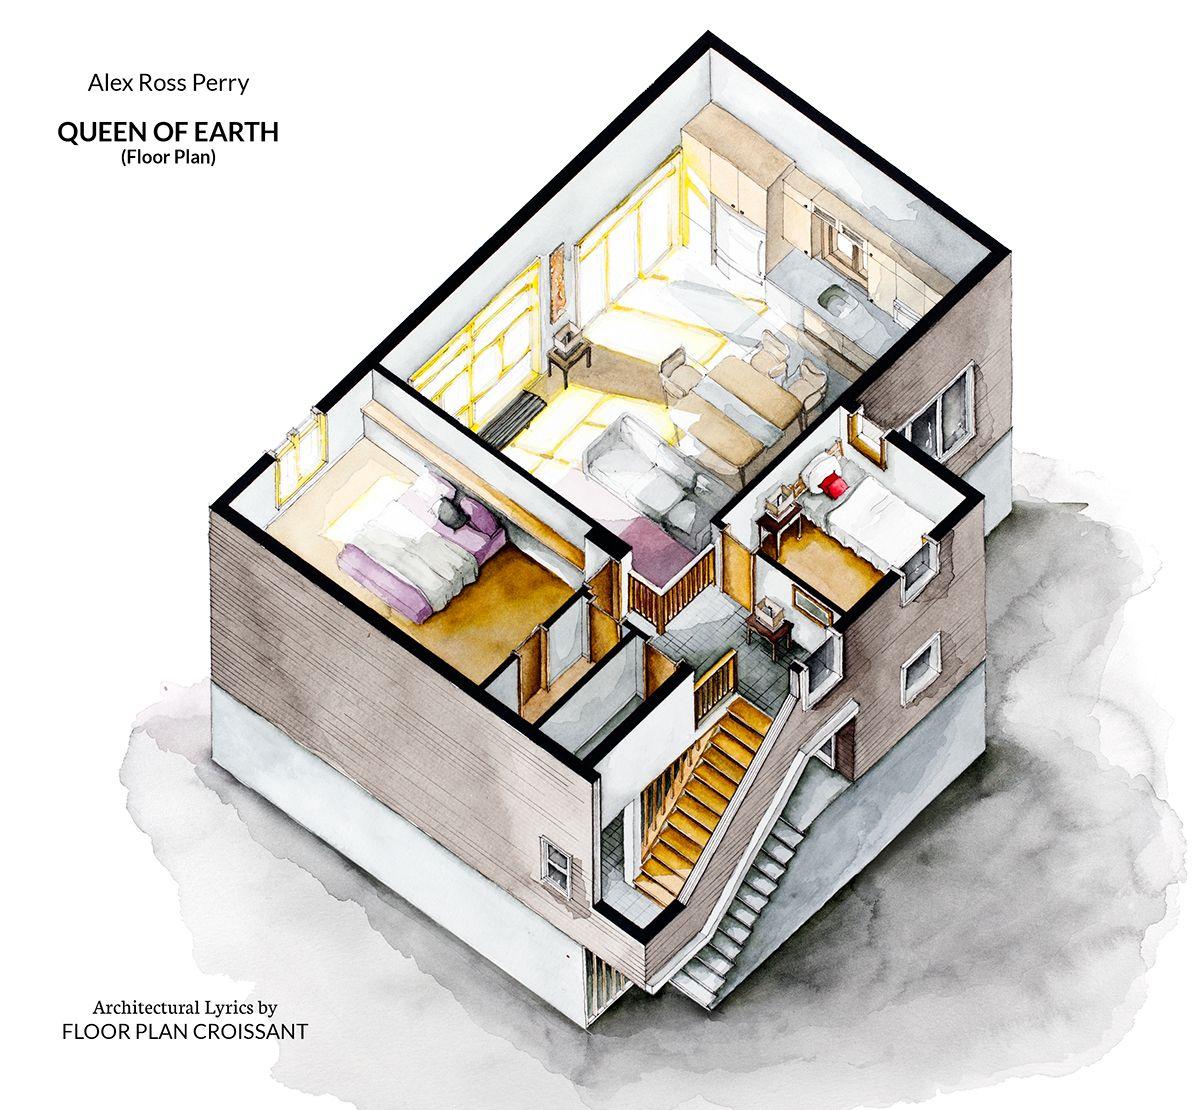 3d Floor Plan Isometric: Watercolor Isometric Floor Plan Of Lake House In Alex Ross